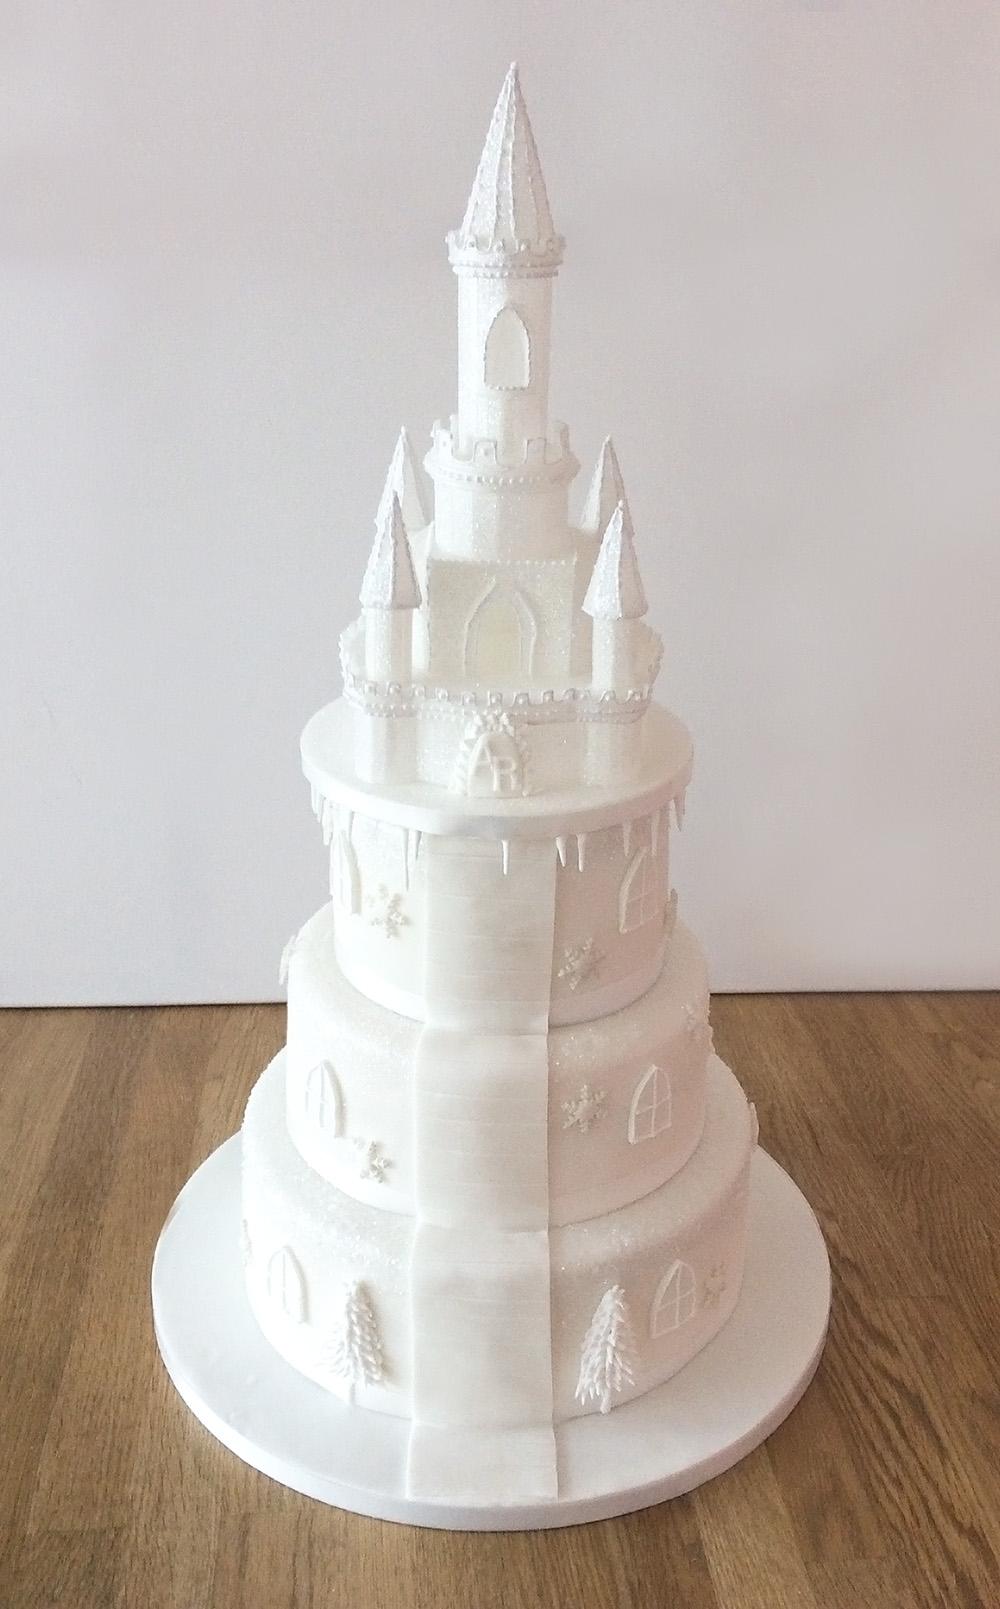 Castle Wedding Cake.Ice Castle Wedding Cake The Cakery Leamington Spa